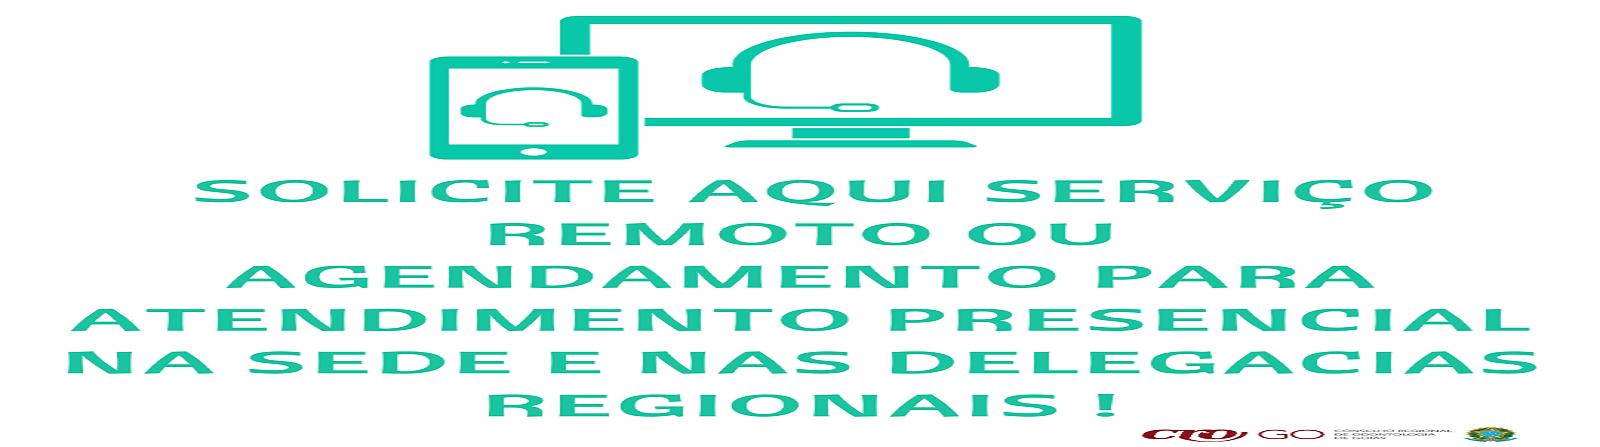 Atendimento_remoto_ou_agendamento_para_atendimento_presencial_na_sede_e_delegacias_-_1600_x_447